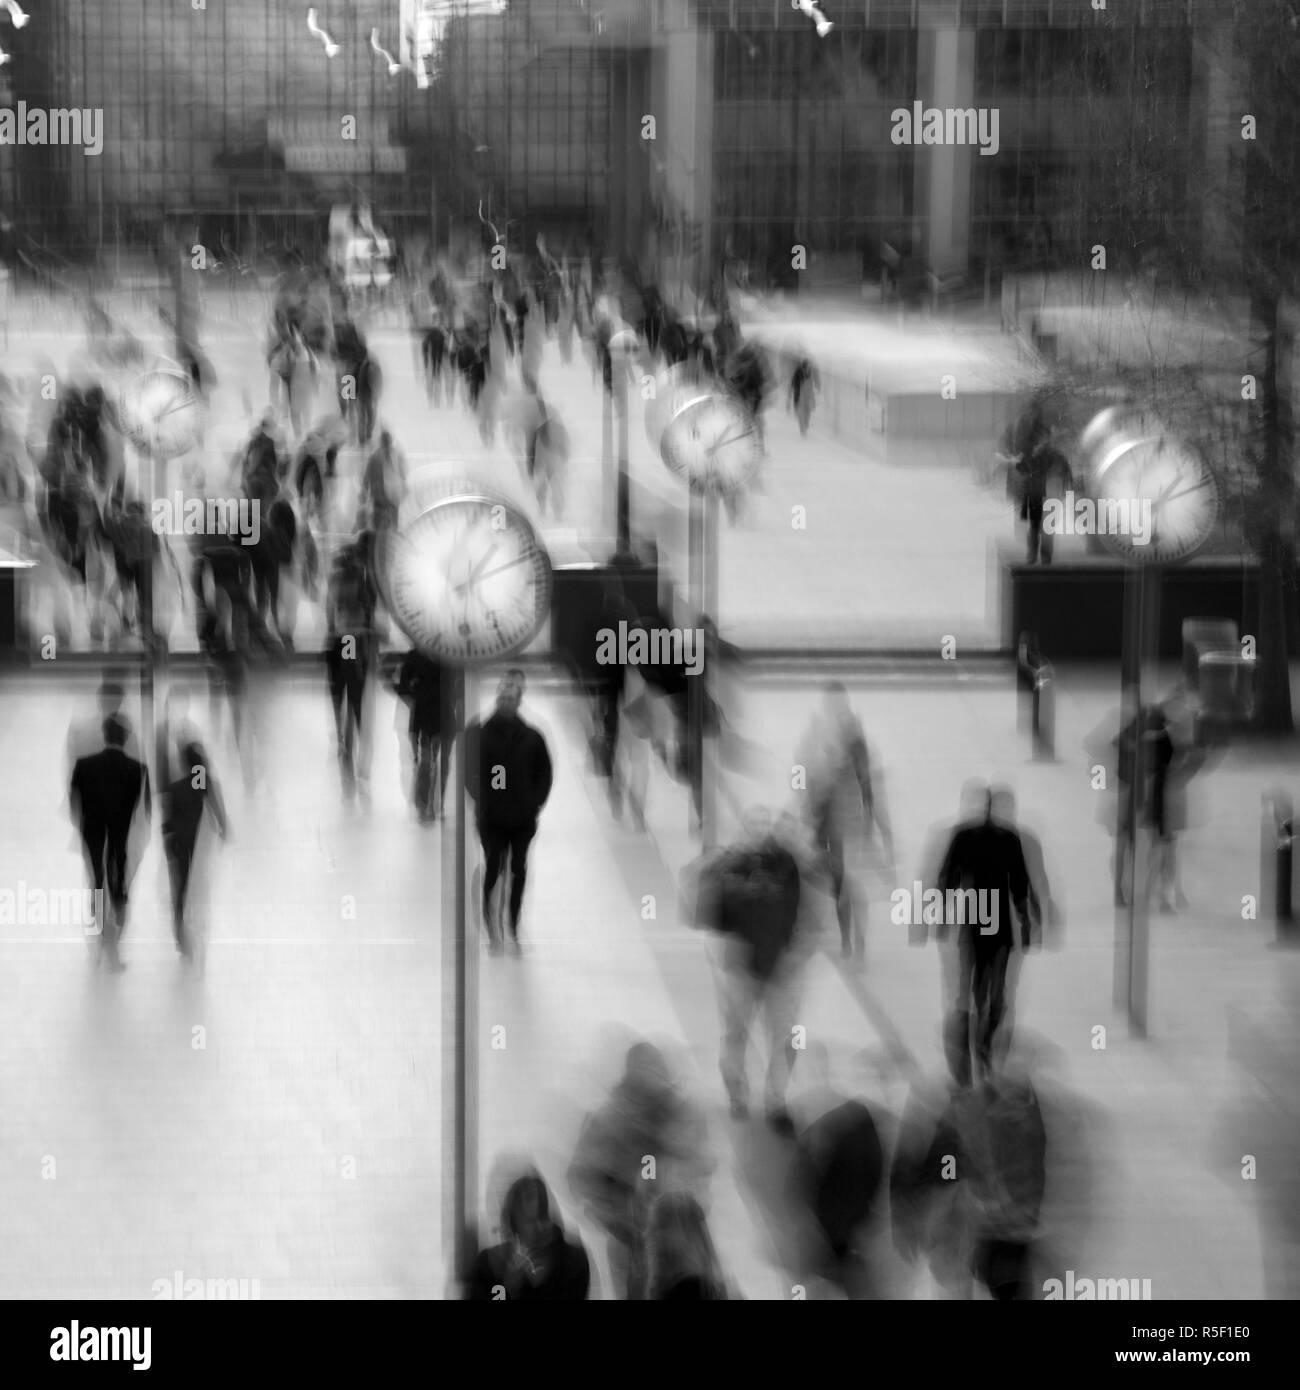 Canary Wharf, Docklands, London, England - Stock Image